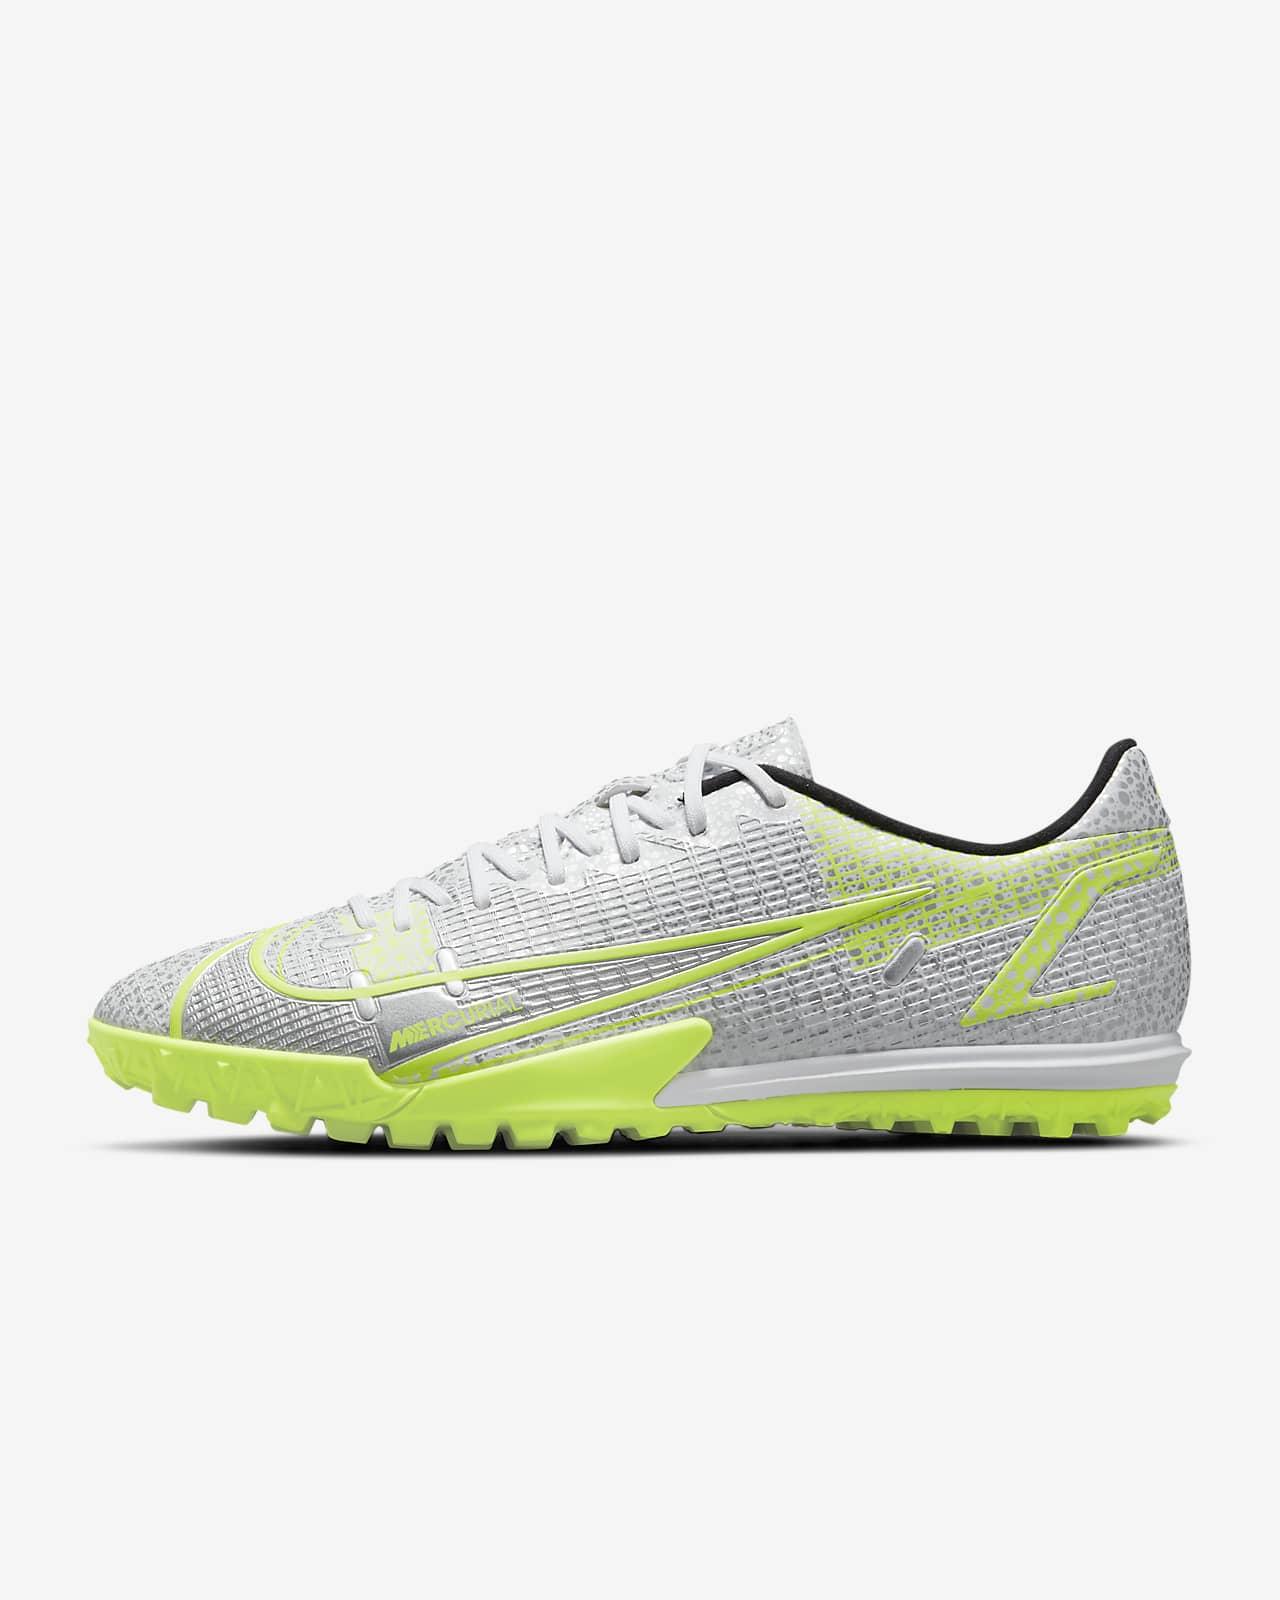 Nike Mercurial Vapor 14 Academy TF Turf Football Shoe